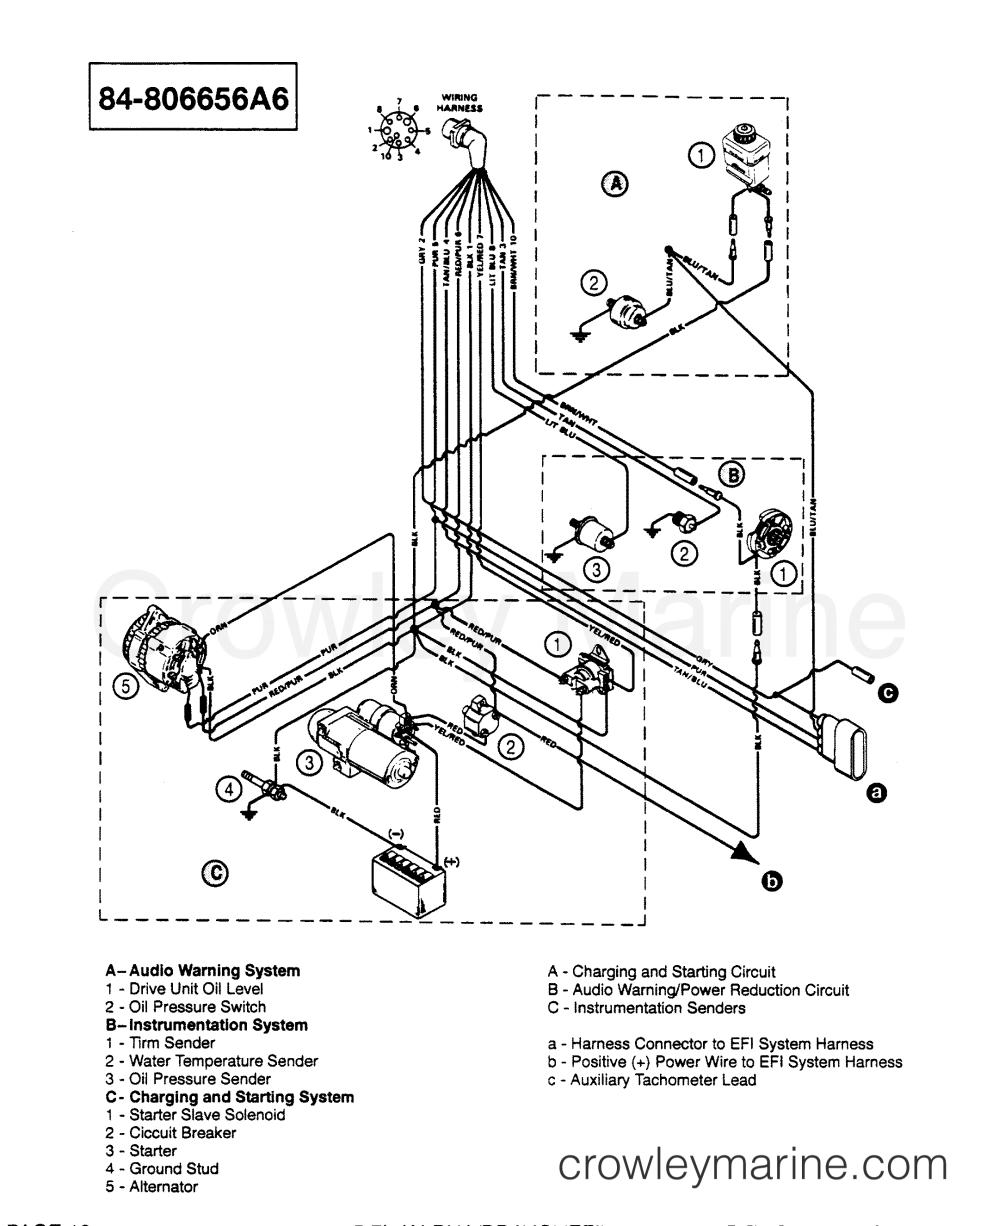 medium resolution of 1994 mercruiser 5 7l tbi bravo 457b111gs wiring harness enginie